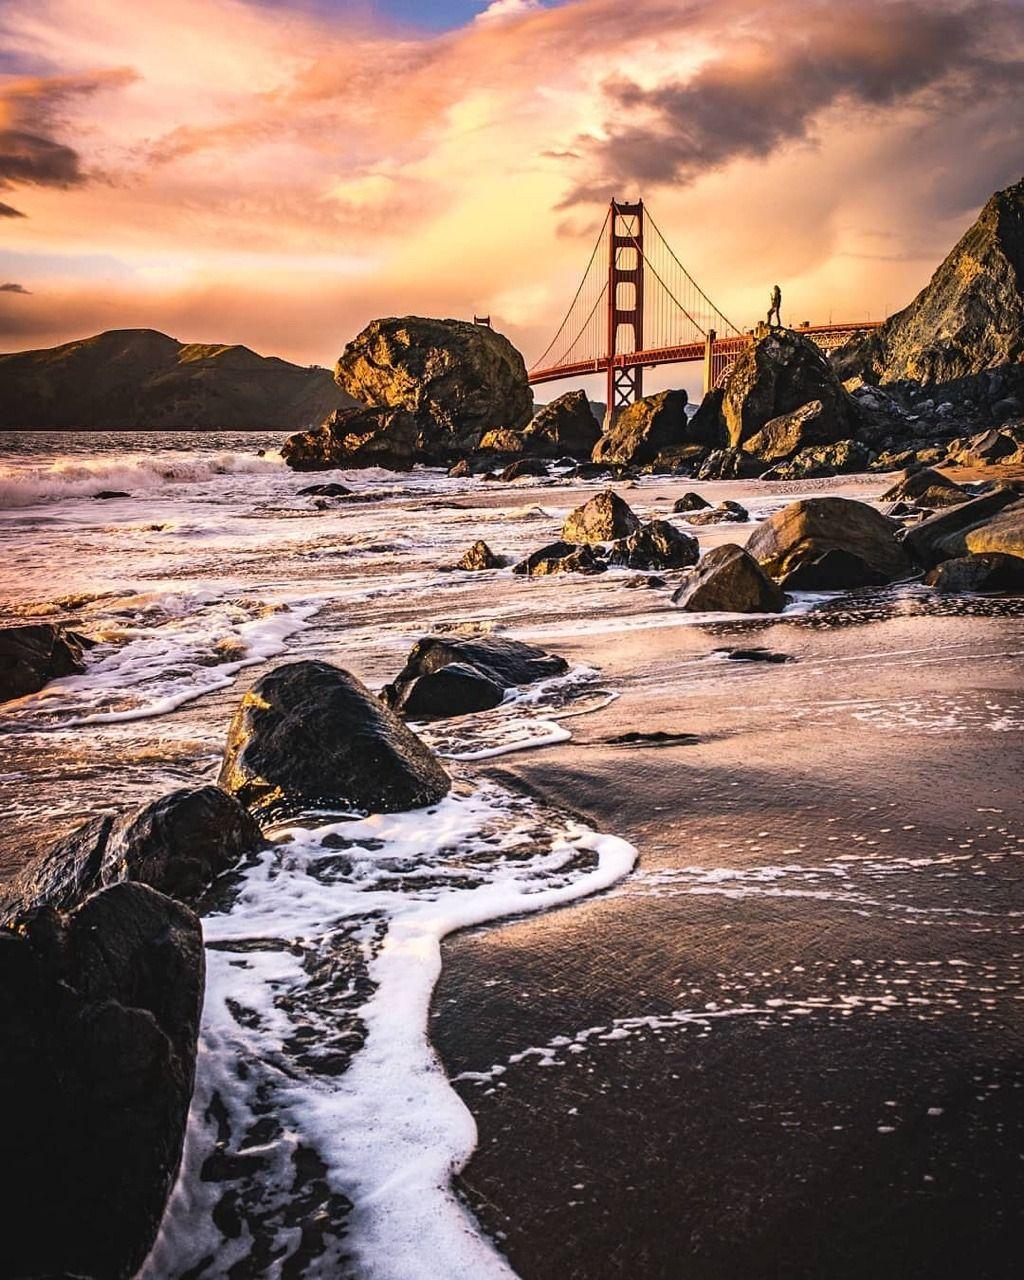 Greyhound Rock Beach near Davenport, California | Travel california coast, California travel